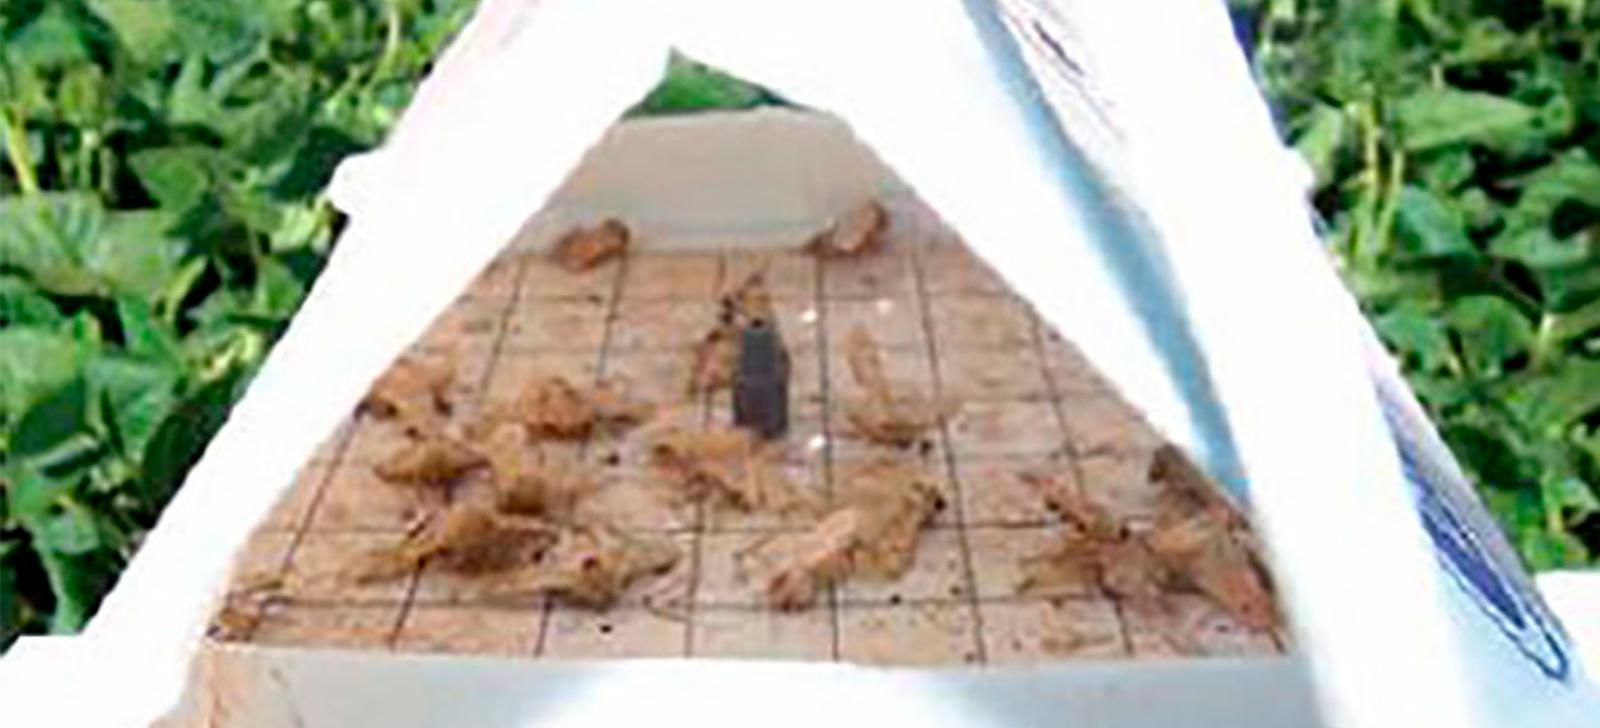 promip manejo integrado de pragas controle biologico armadilha mariposas